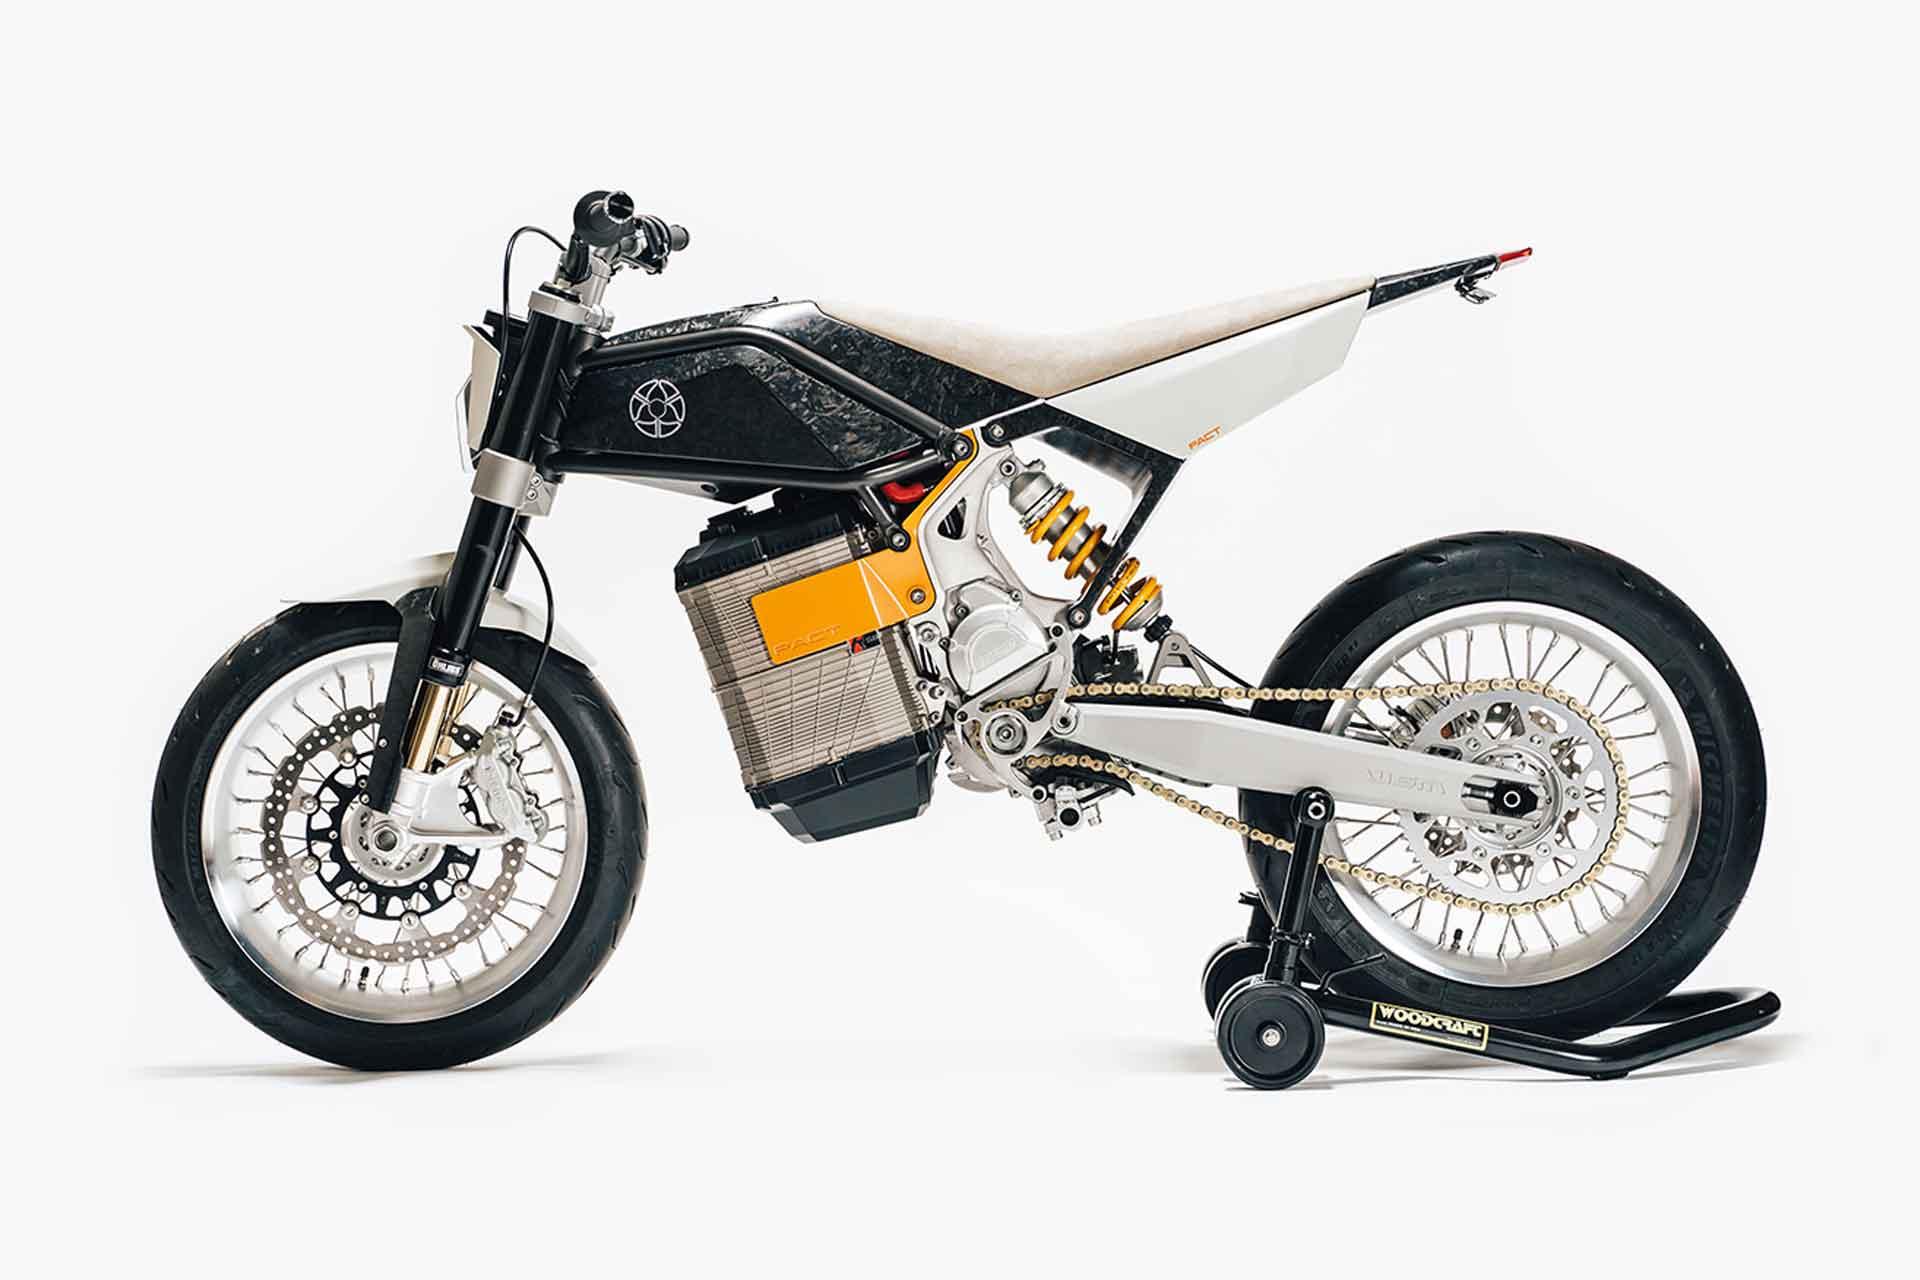 Walt Siegl Alta Redshift PACT Motorcycle